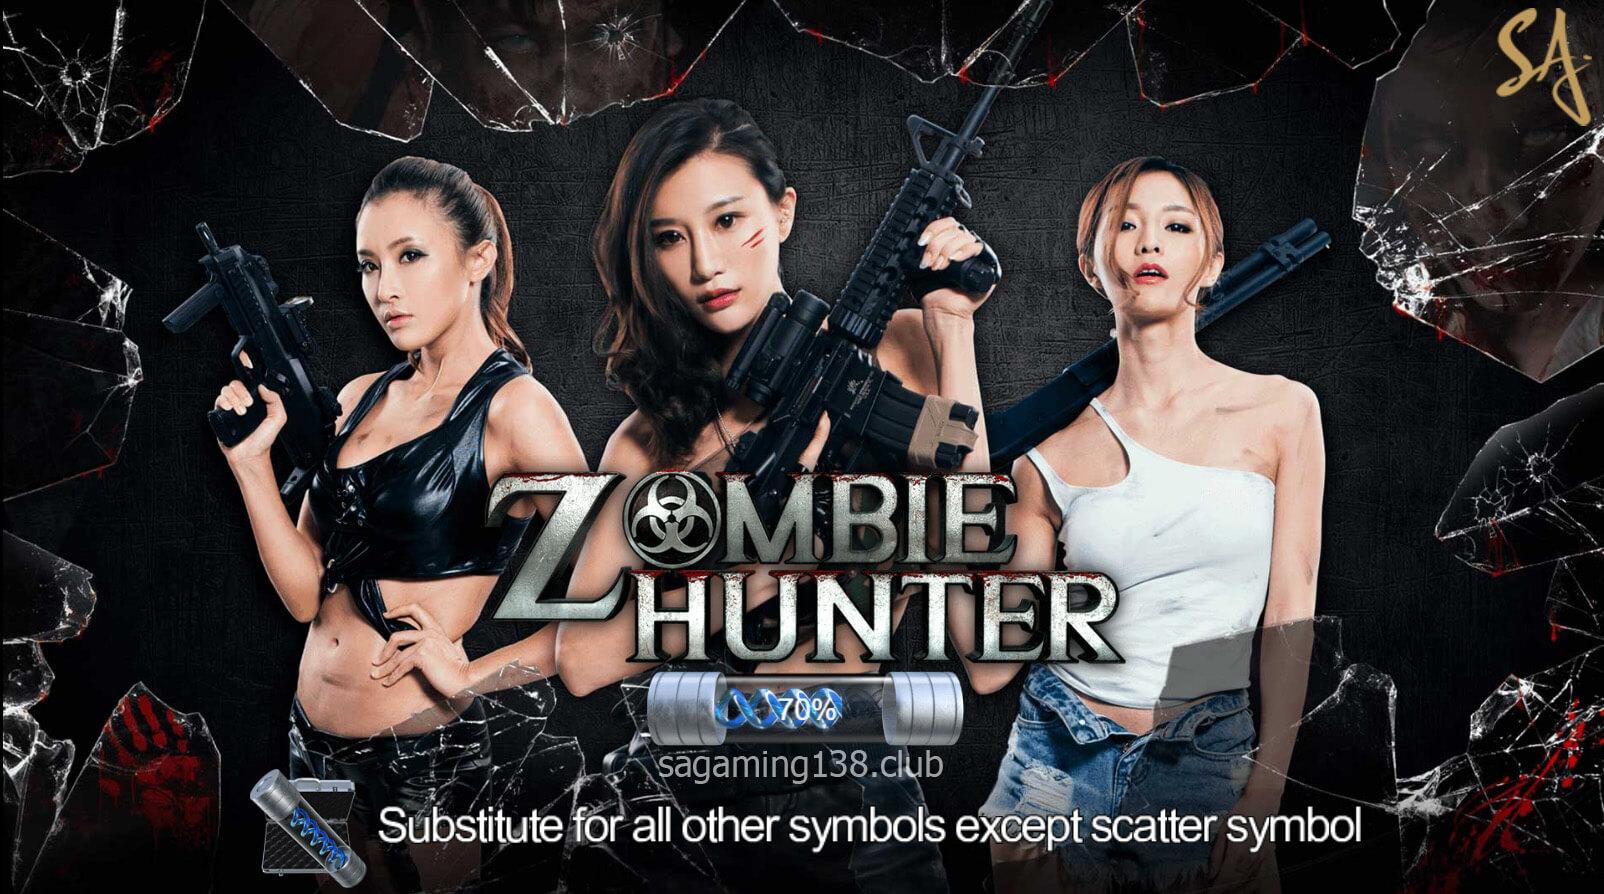 Zombie Hunter เกมสล็อตออนไลน์ 8 SA Gaming คาสิโนออนไลน์ที่ดีที่สุด